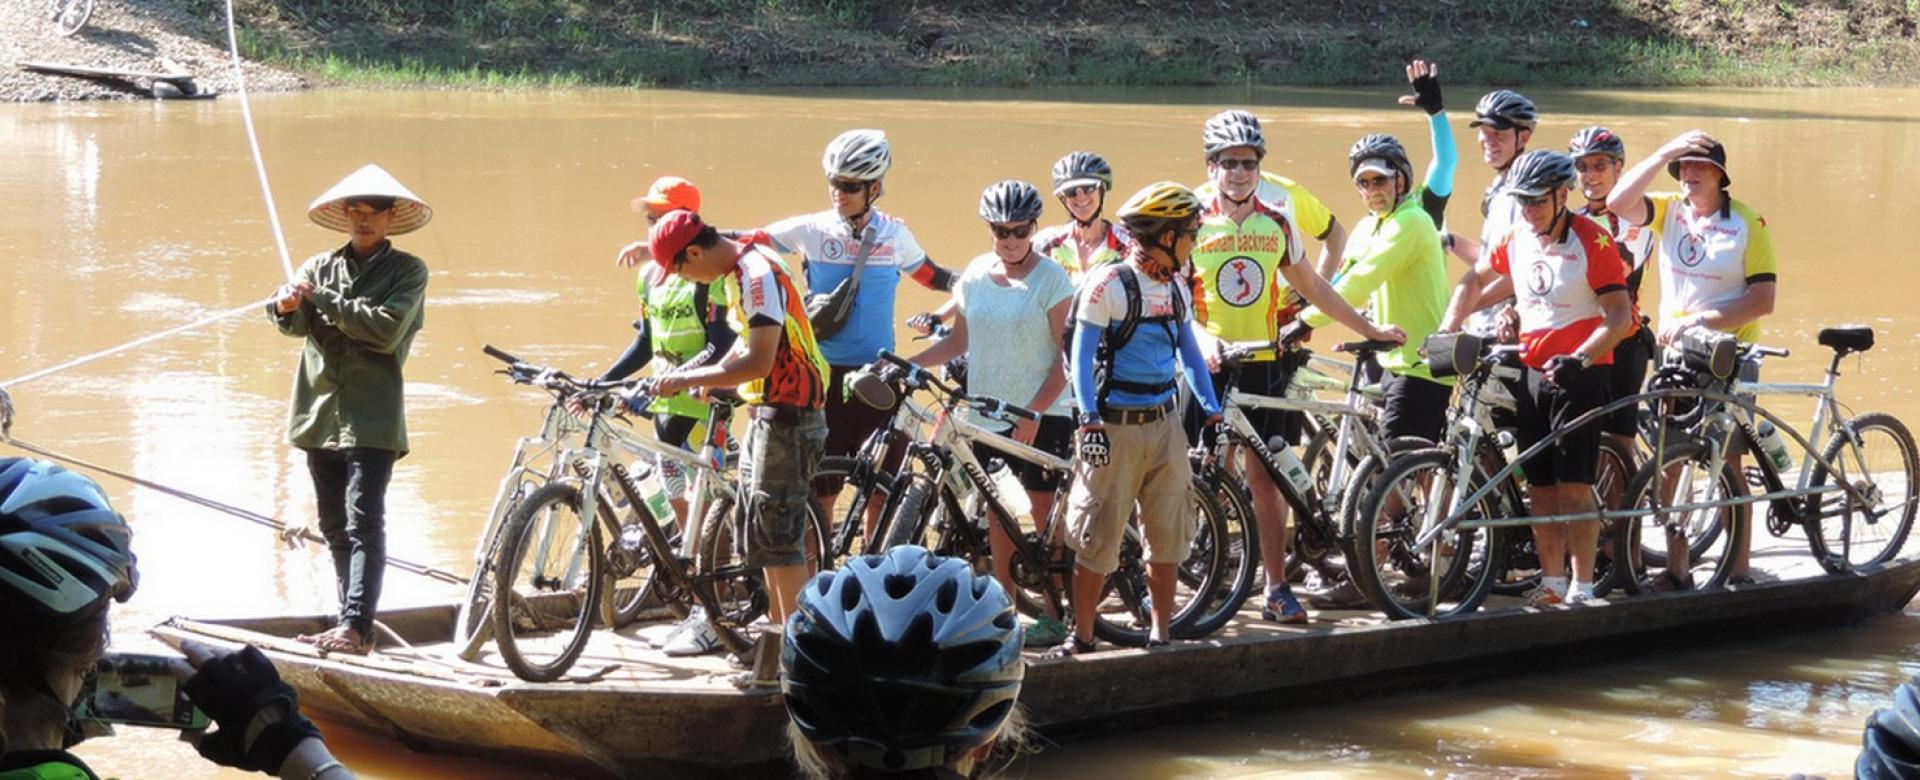 Biking to Phan Thiet - Dalat -  Ban Me Thuot - Kon Tum - Quang Ngai - Hoi An